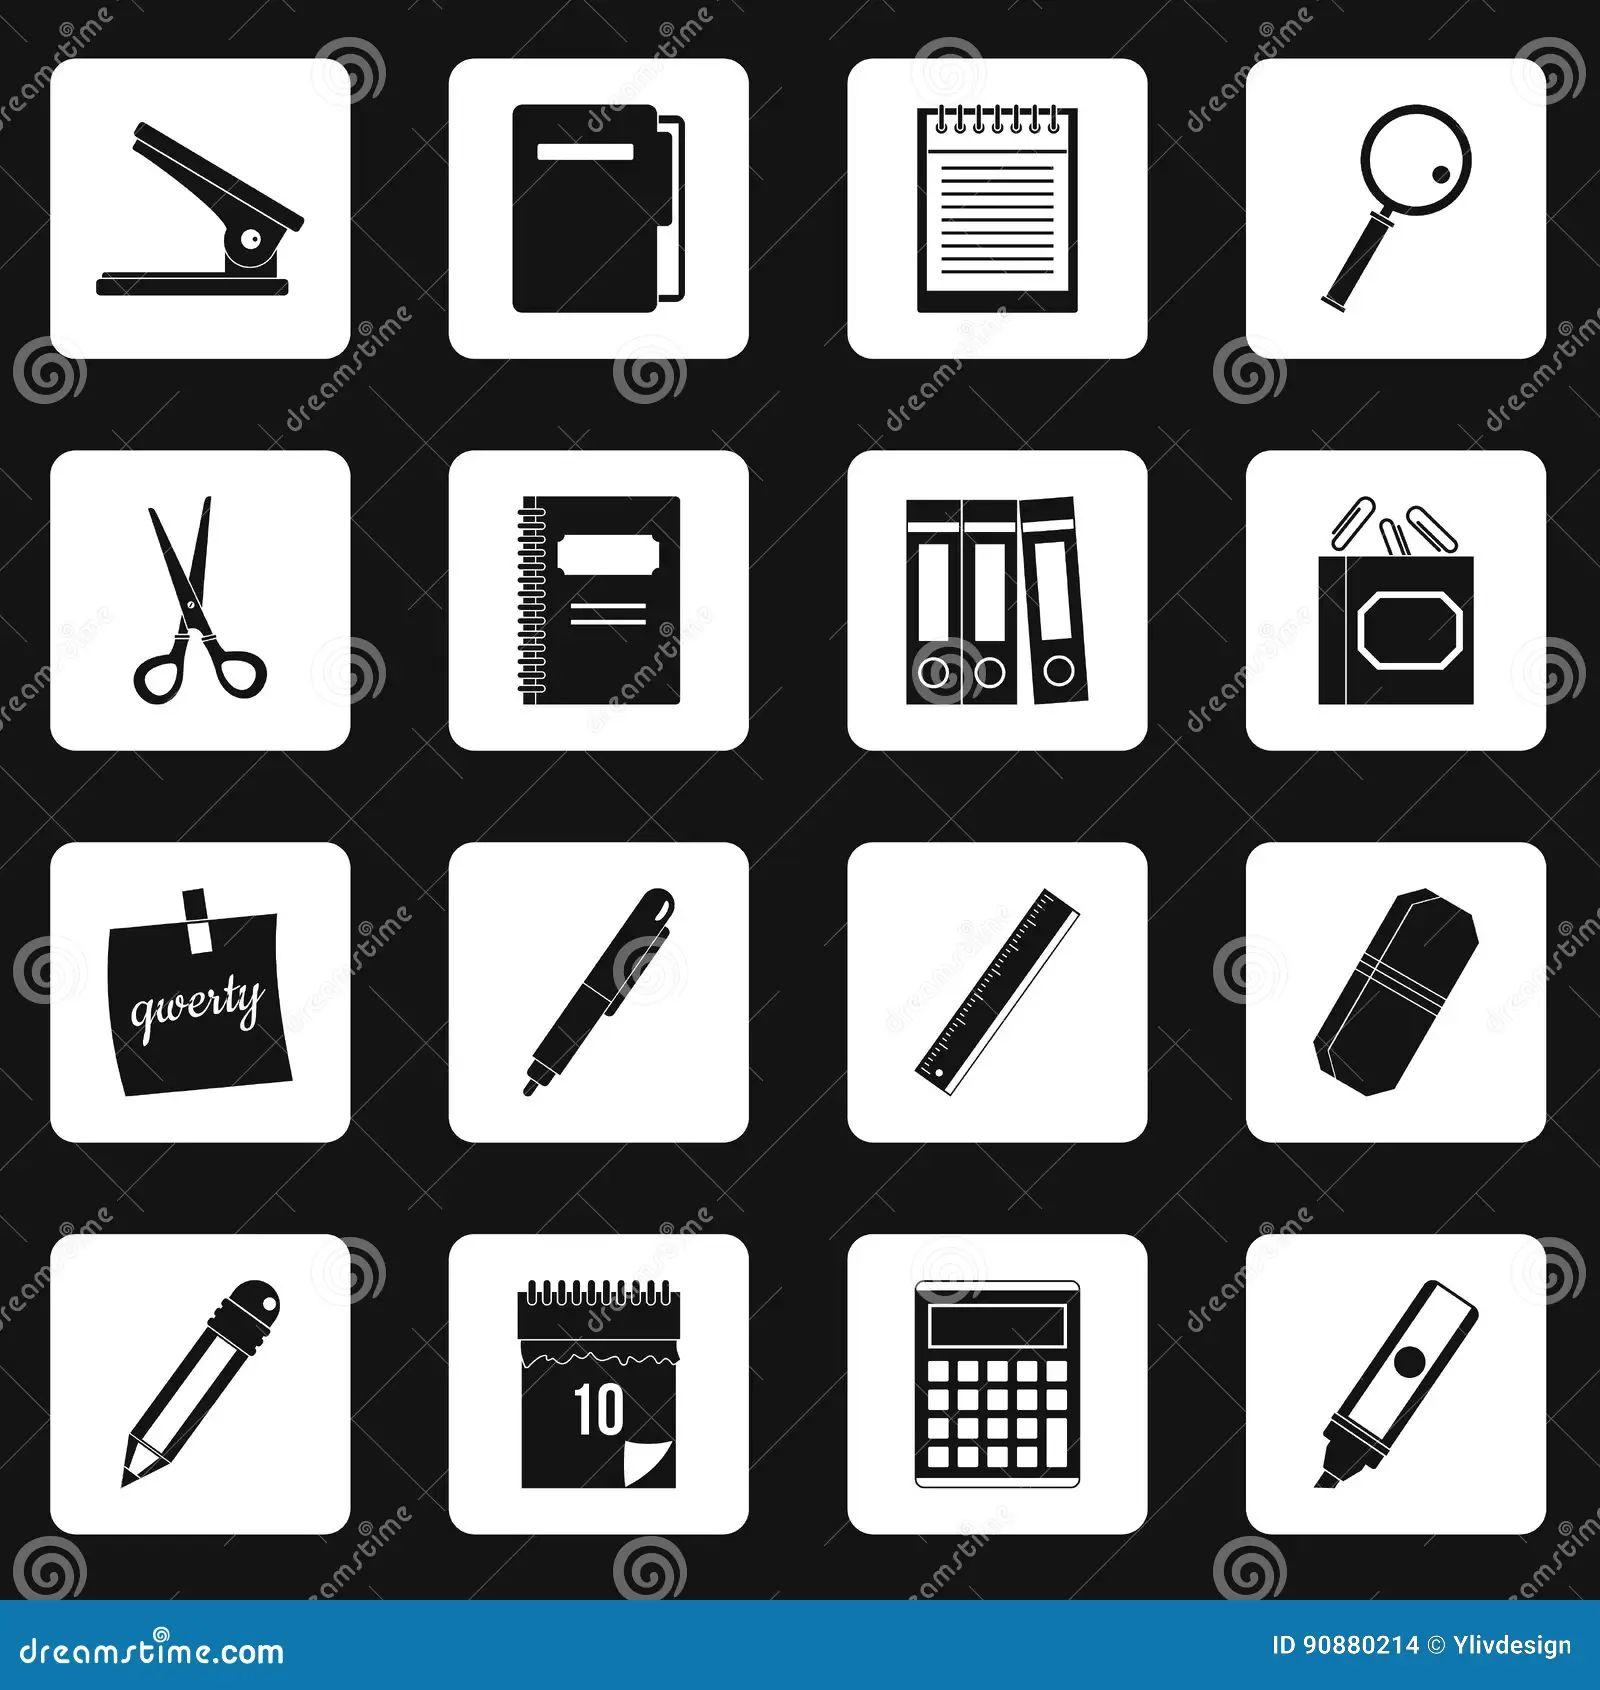 Vector Audio Symbols Set Auto Electrical Wiring Diagram Wiringdiagram Baldor Electric Motor Diagrams Coverpools Stationery Icons Squares Stock